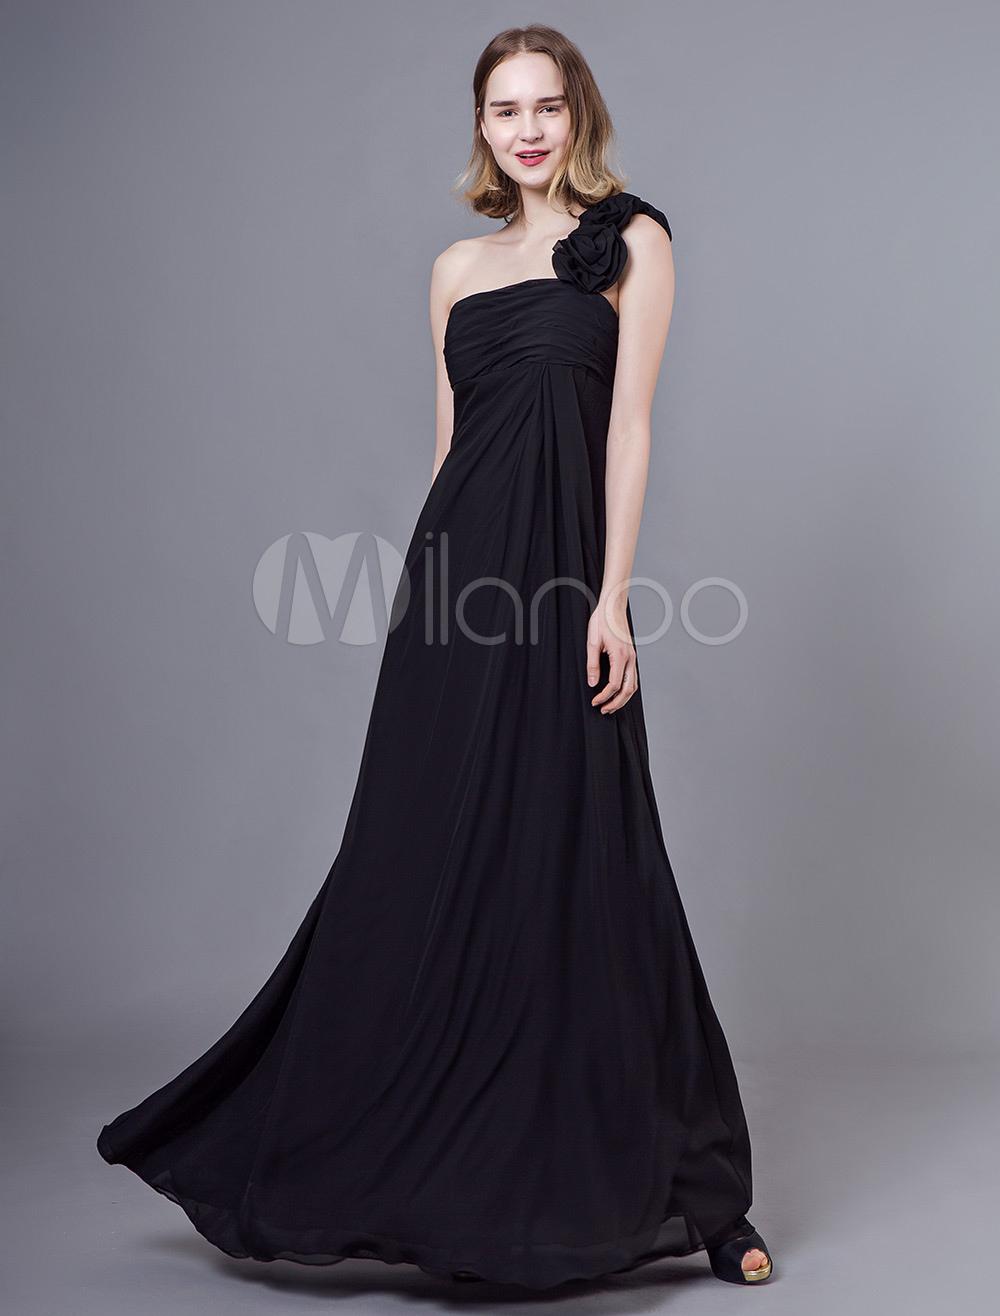 صور فستان طويل اسود , صور فساتين طويله باللون الاسود